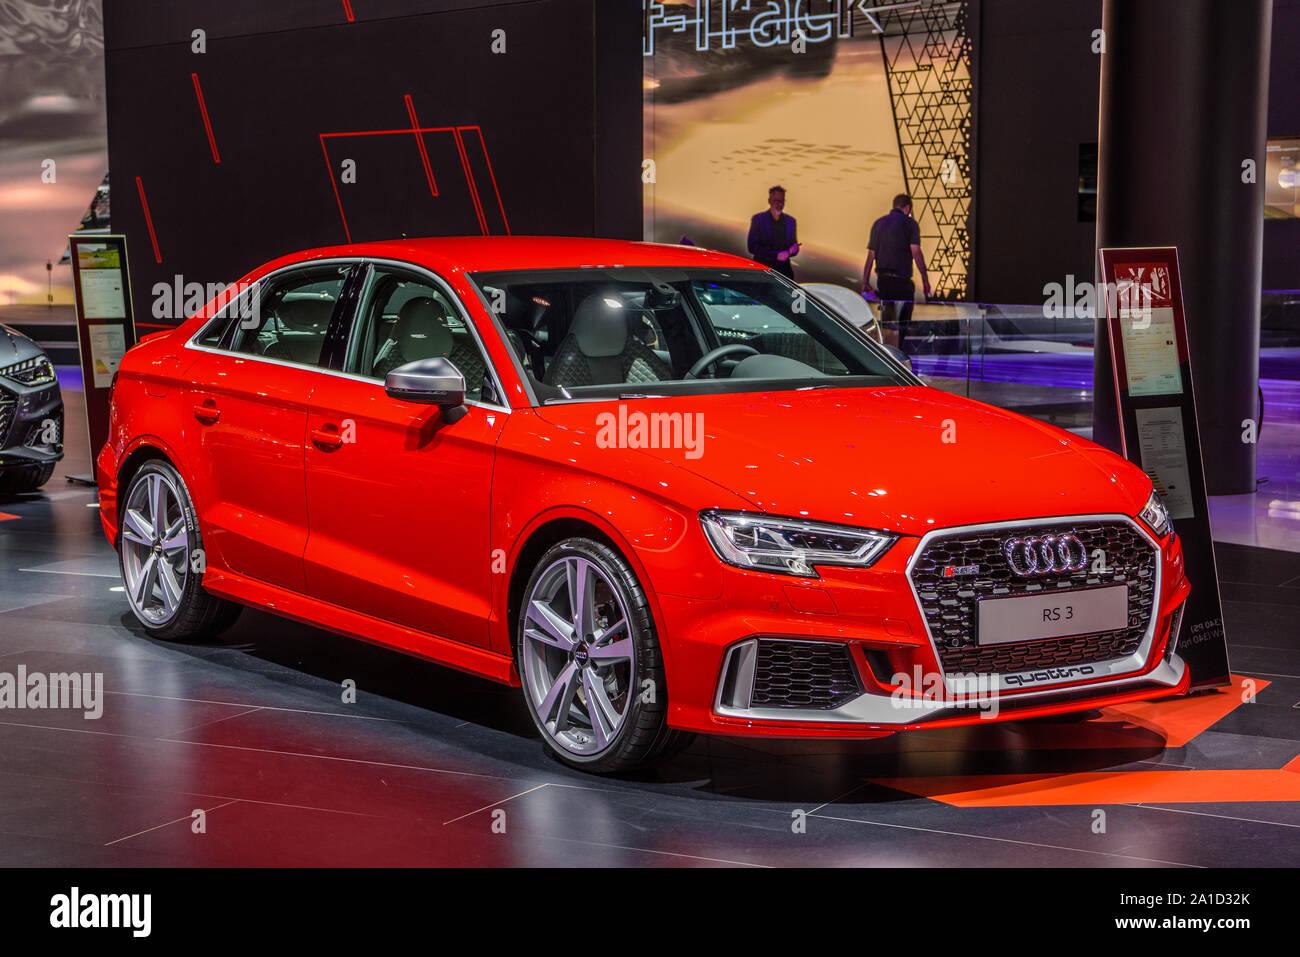 Frankfurt Germany Sept 2019 Red Audi Rs3 A3 3rd Generation Sedan Iaa International Motor Show Auto Exhibtion Stock Photo Alamy